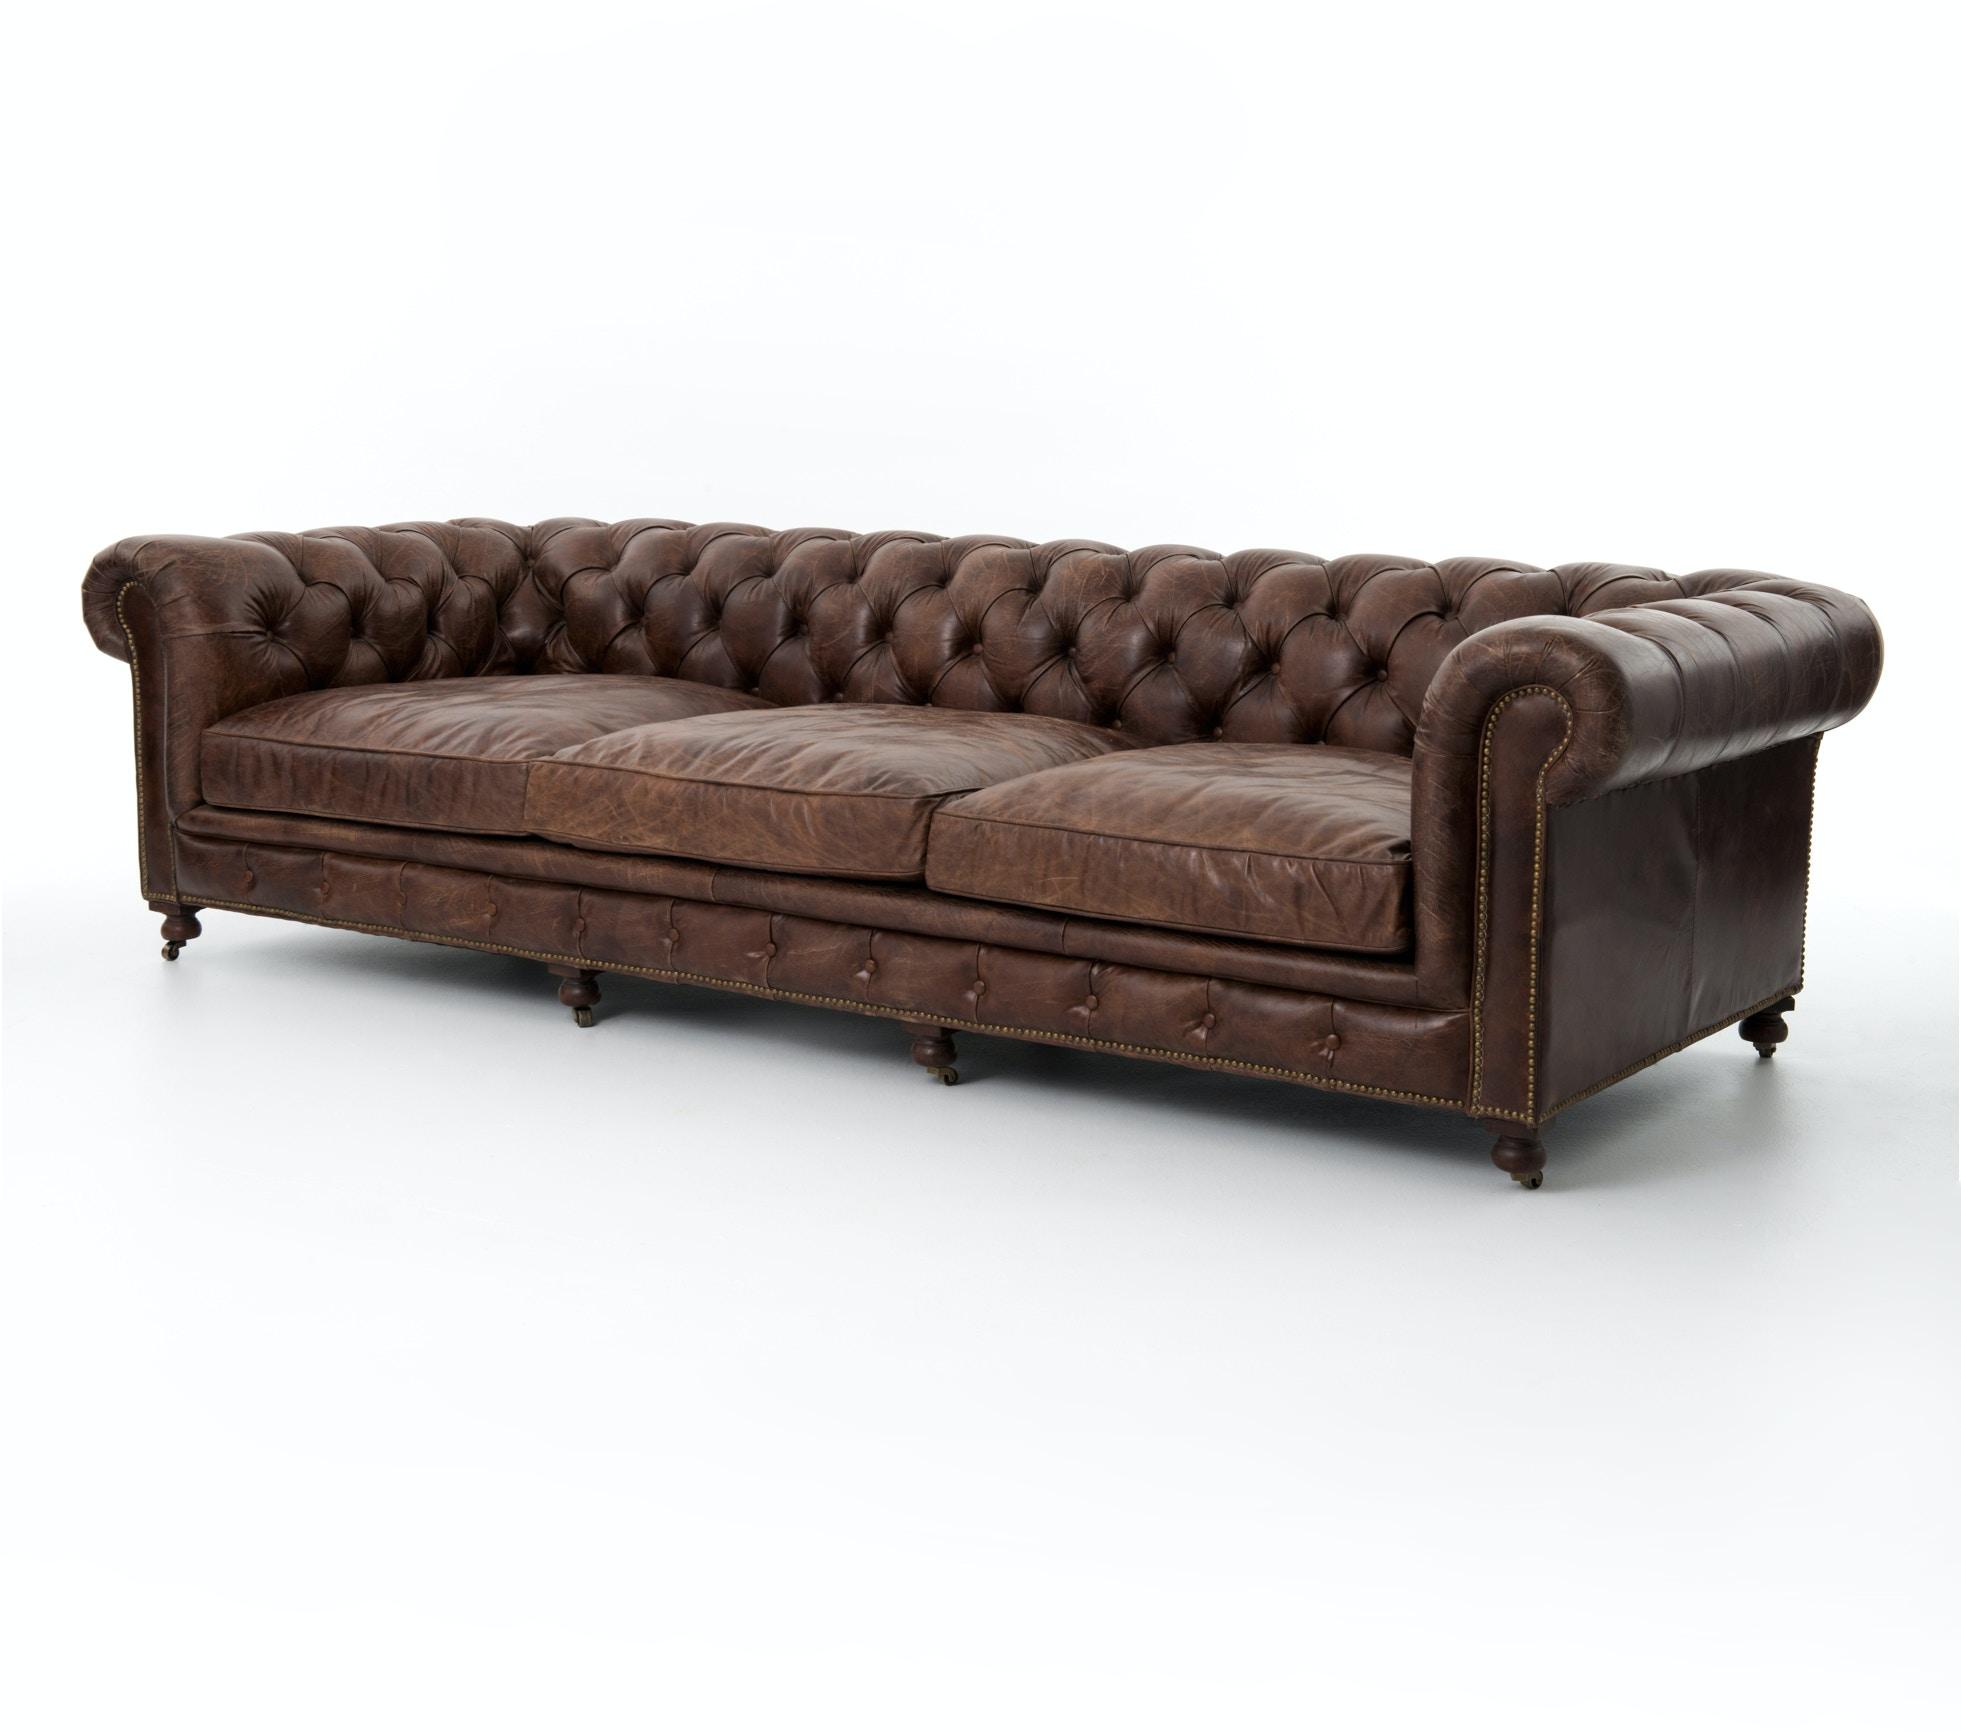 Four hands furniture ccar 35 living room conrad 118 sofa cigar for Furniture 35